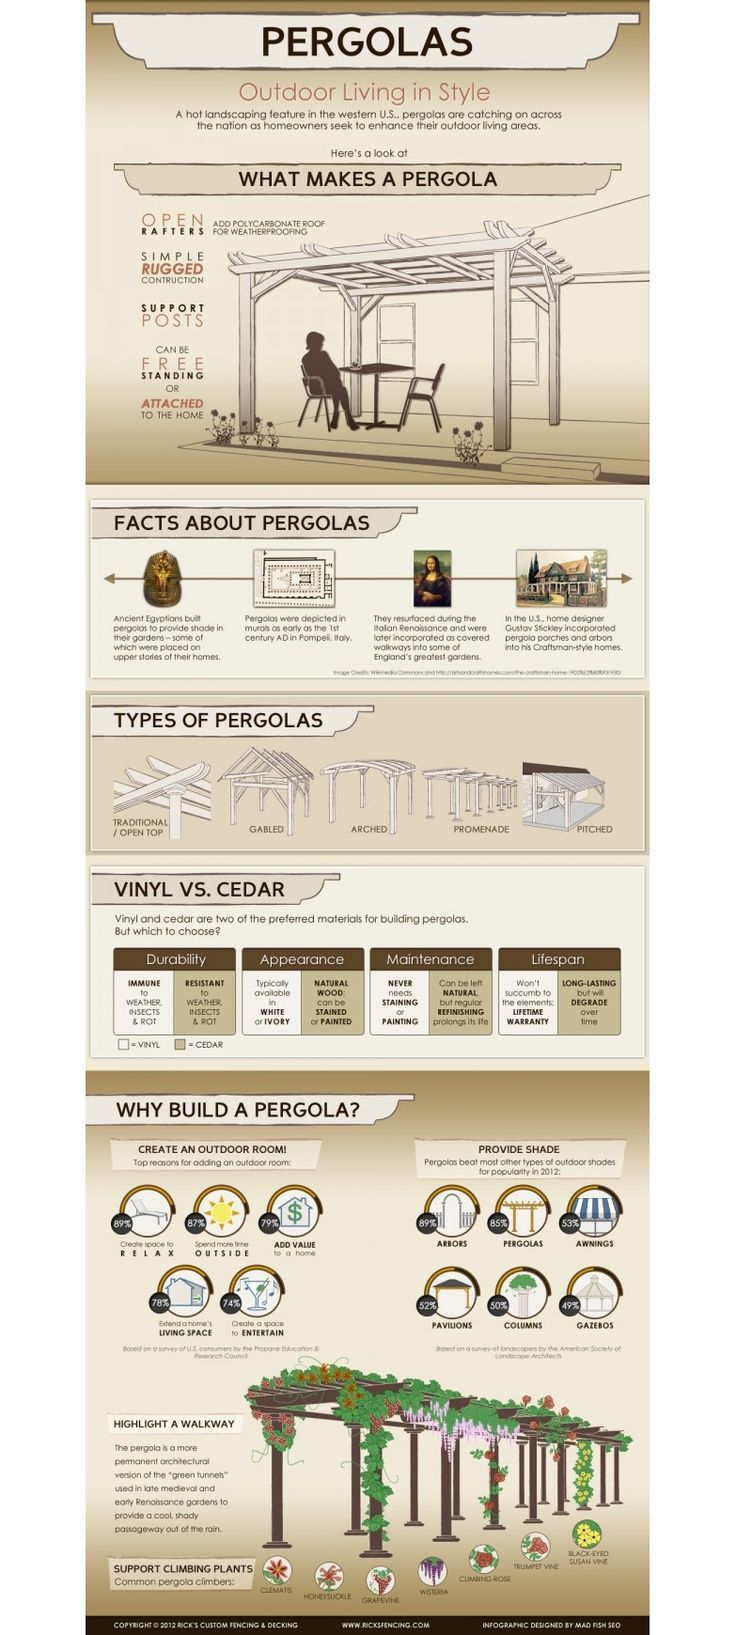 Why build a pergola?